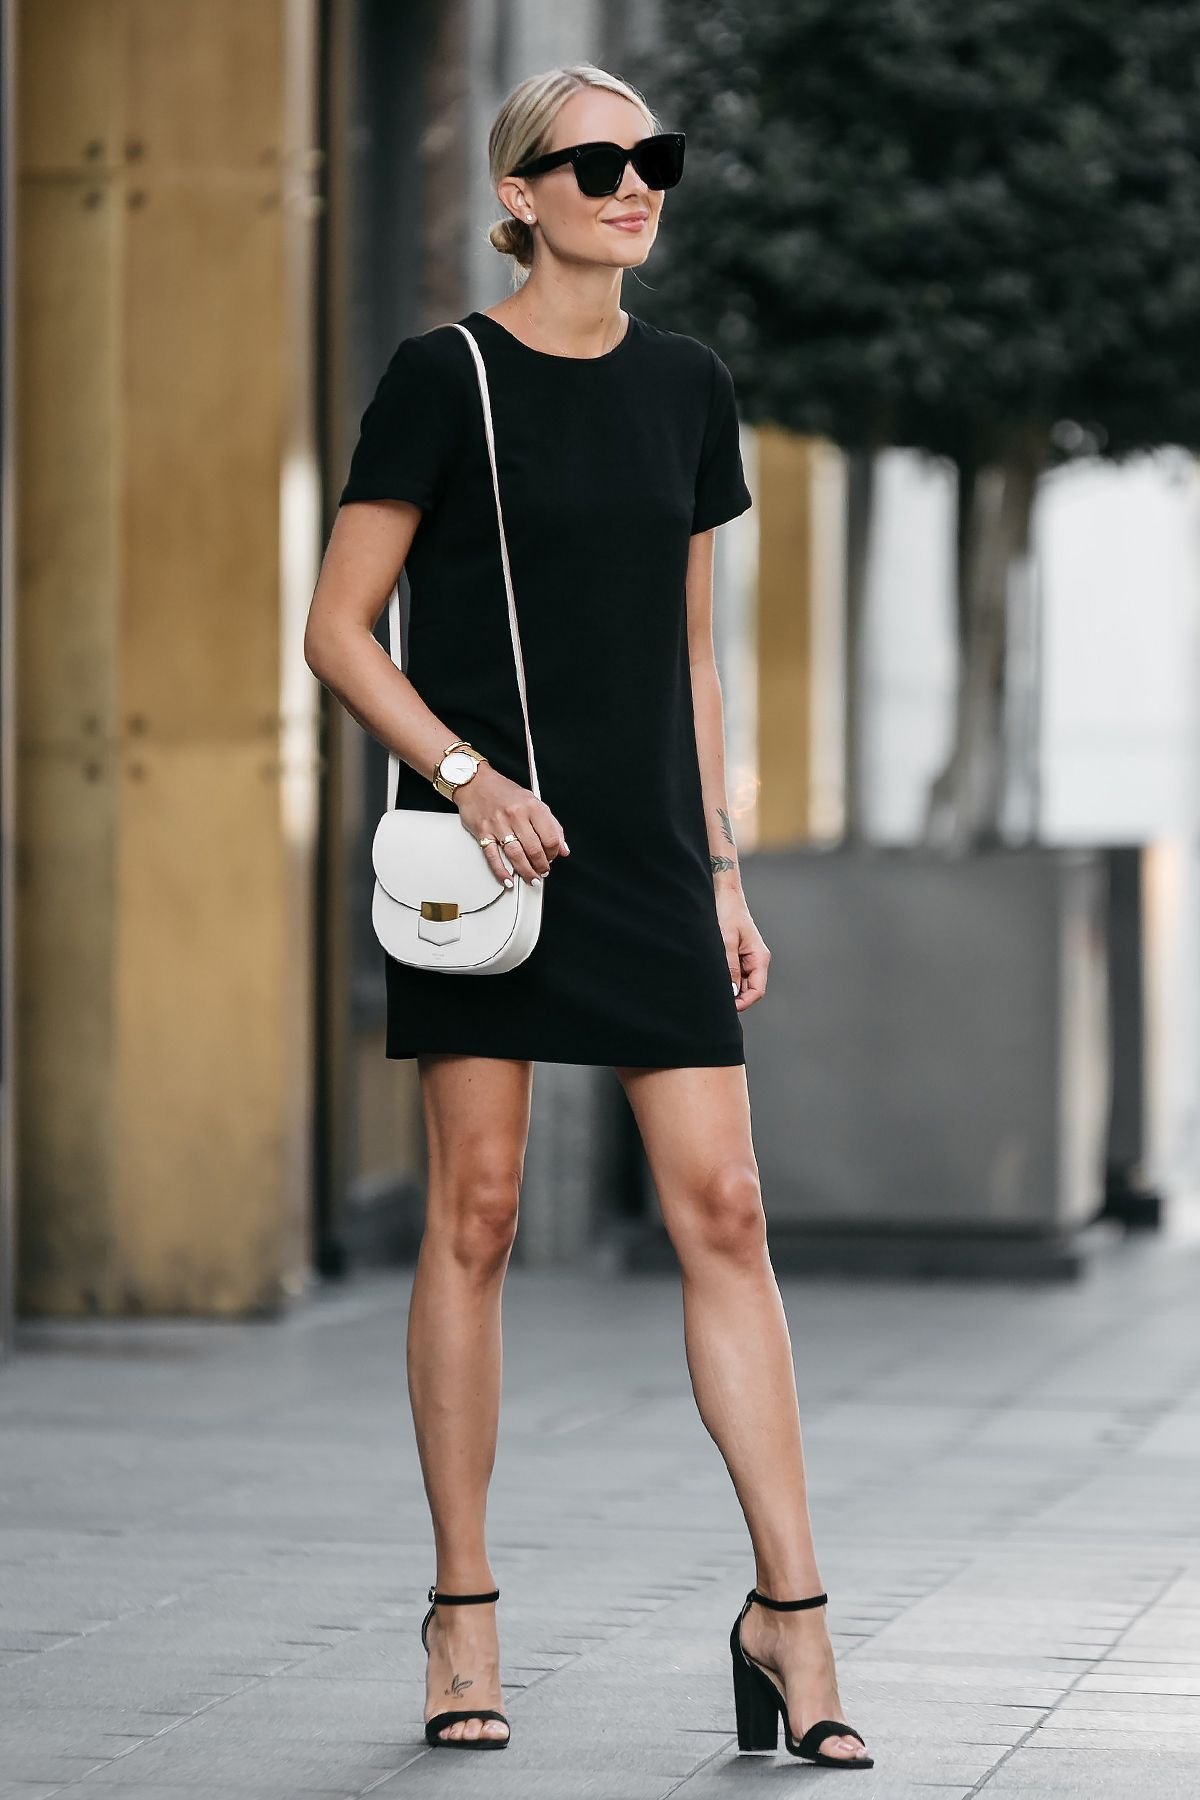 Blonde Wearing Nordstrom Black Shift Dress Outfit Black Ankle Strap Heeled Sandals Celine White Trotteur Handbag Fashion Jackson Simple Casual Outfits Fashion [ 1800 x 1200 Pixel ]